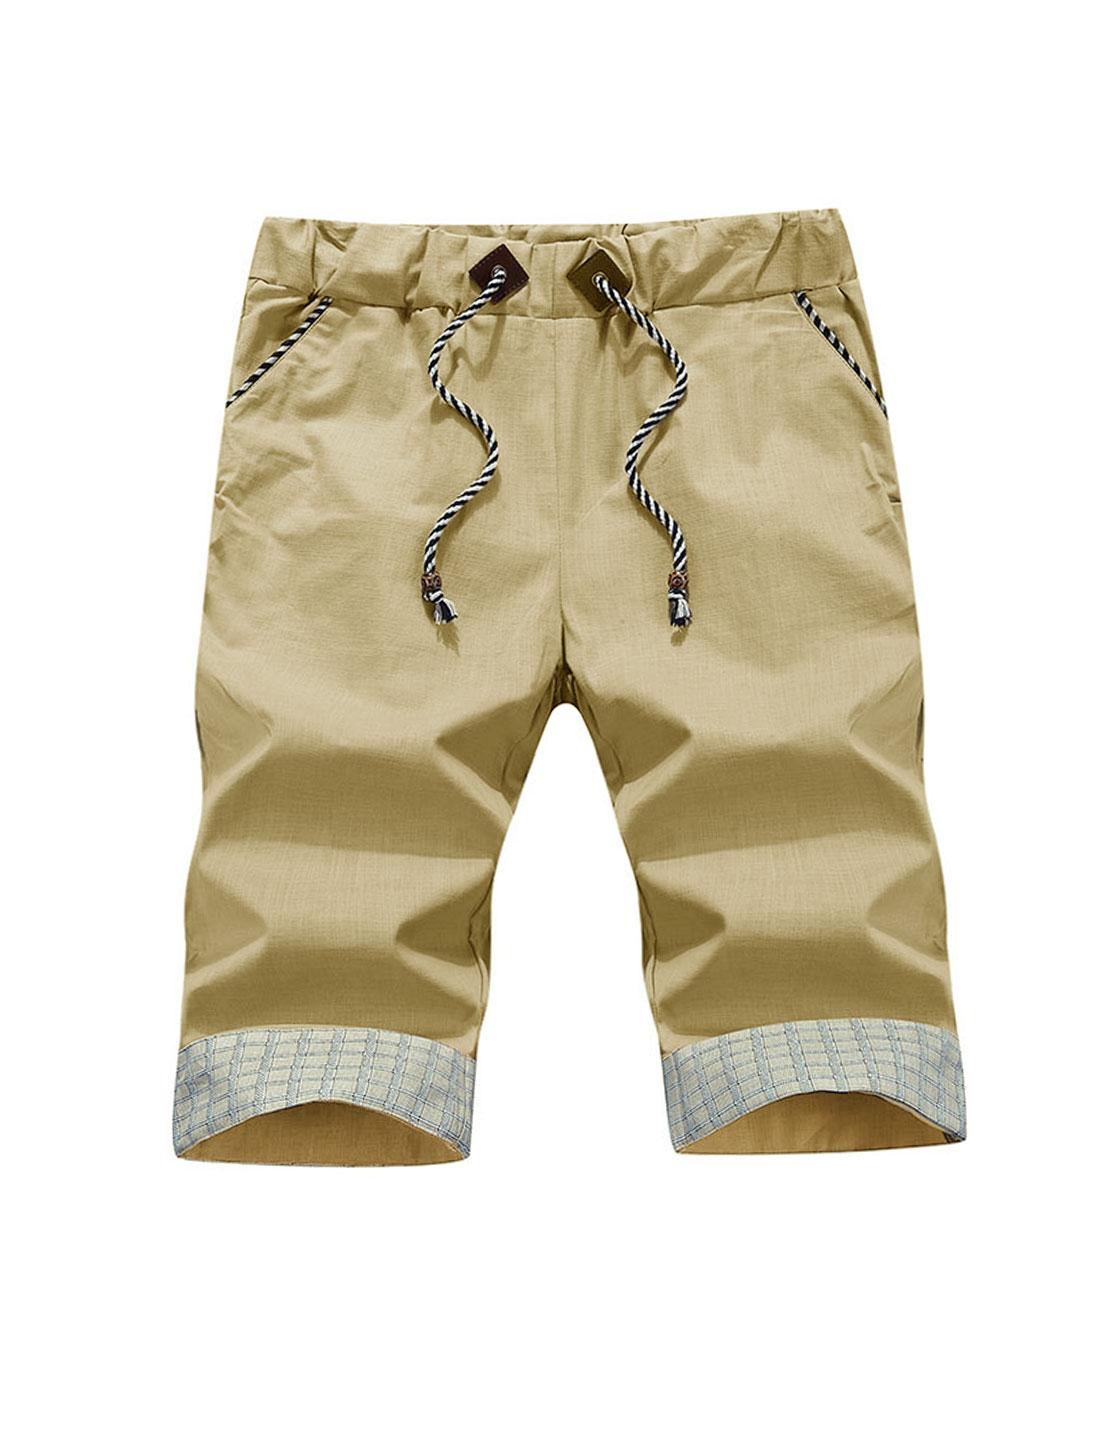 Men Elastic Waist Roll Up Cuffs Casual Shorts Khaki W32